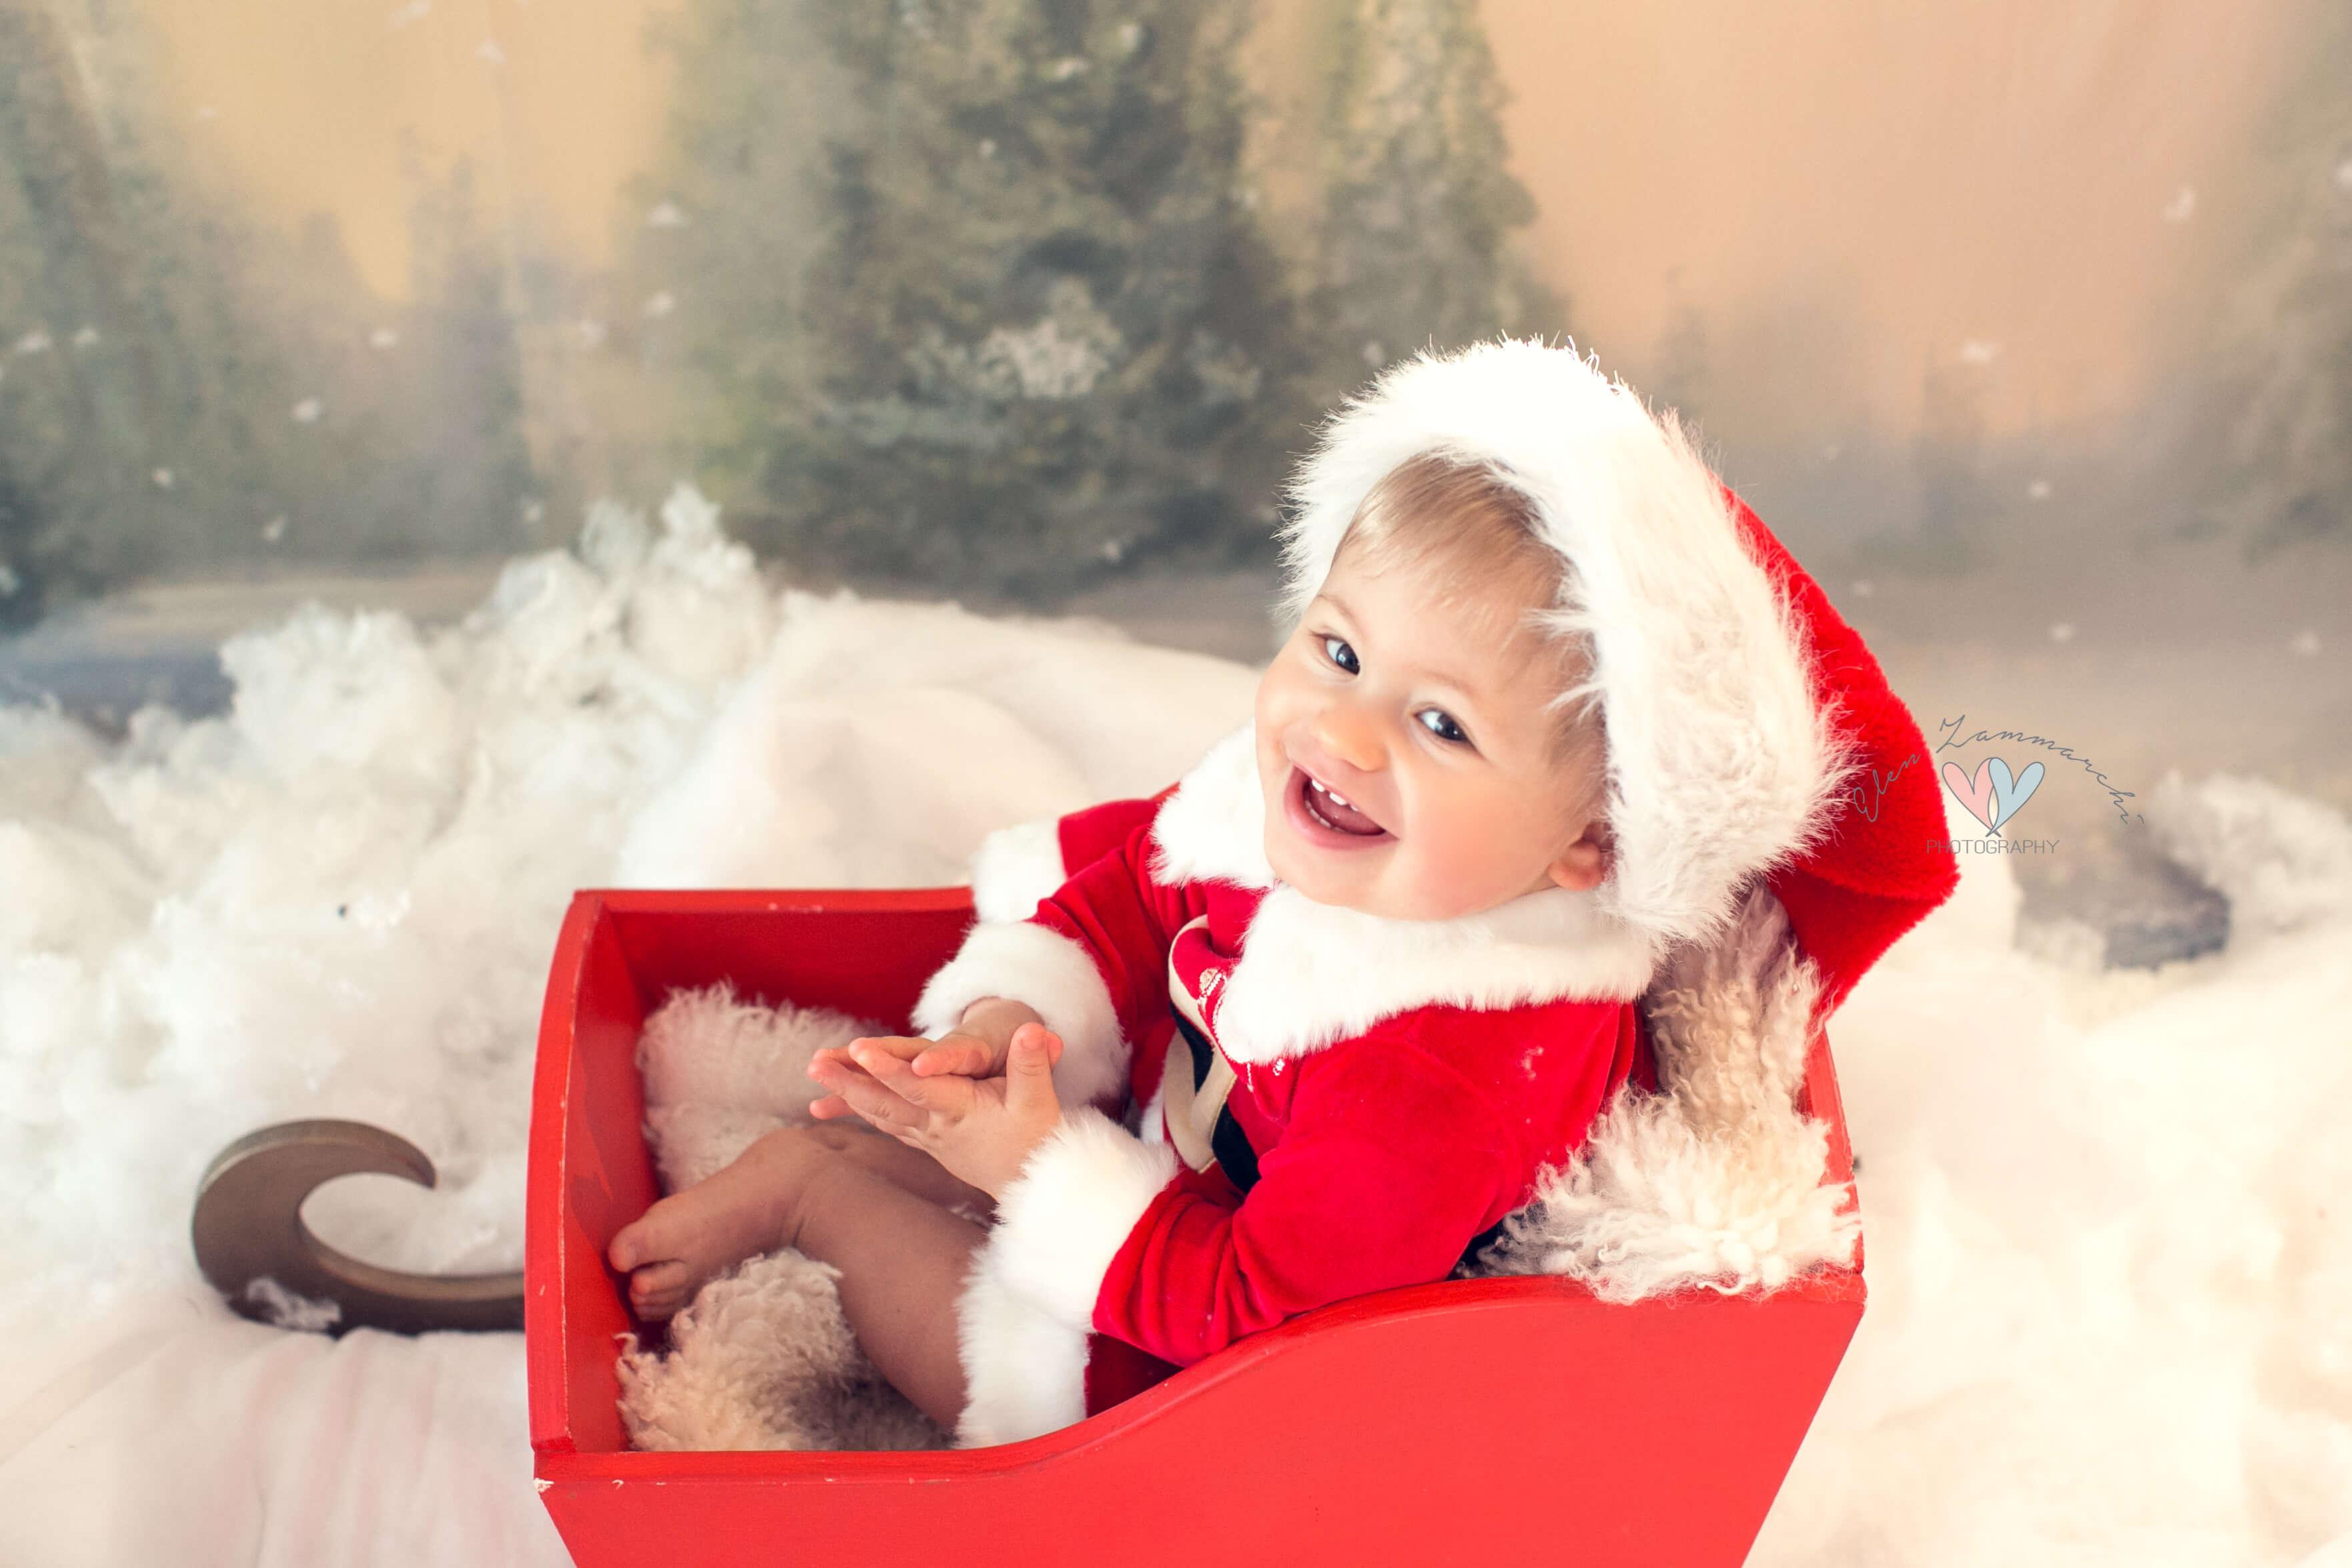 servizio fotografico natalizio elen zammarchi ravenna